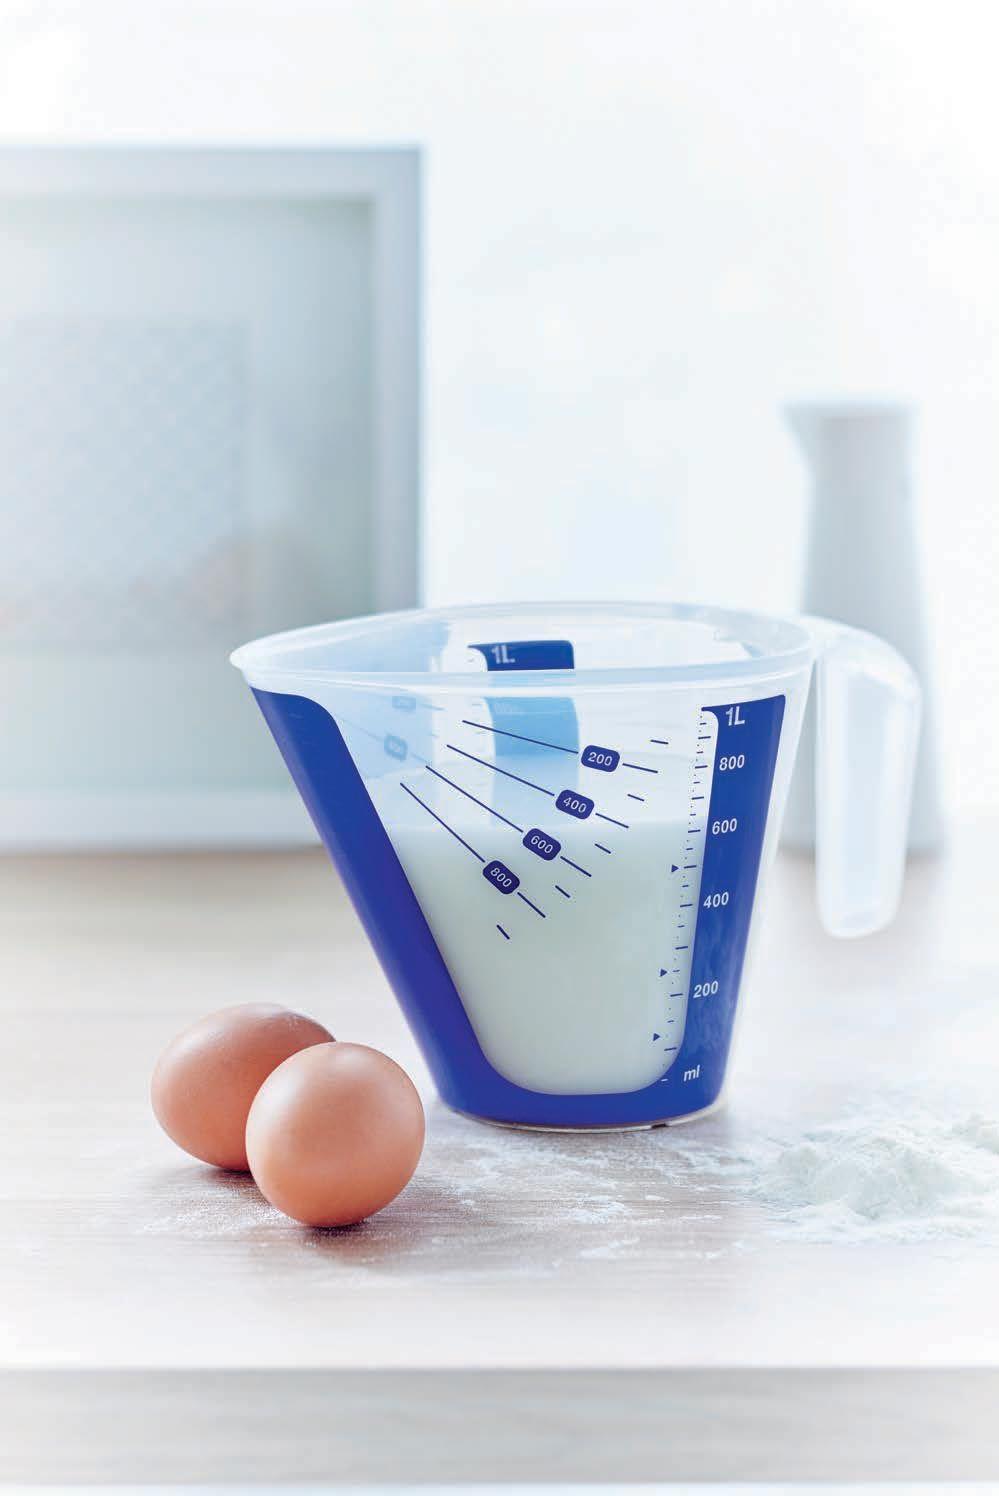 Tupperware UK 1L Measuring jug. Easy and accurate measuring! #baking ...